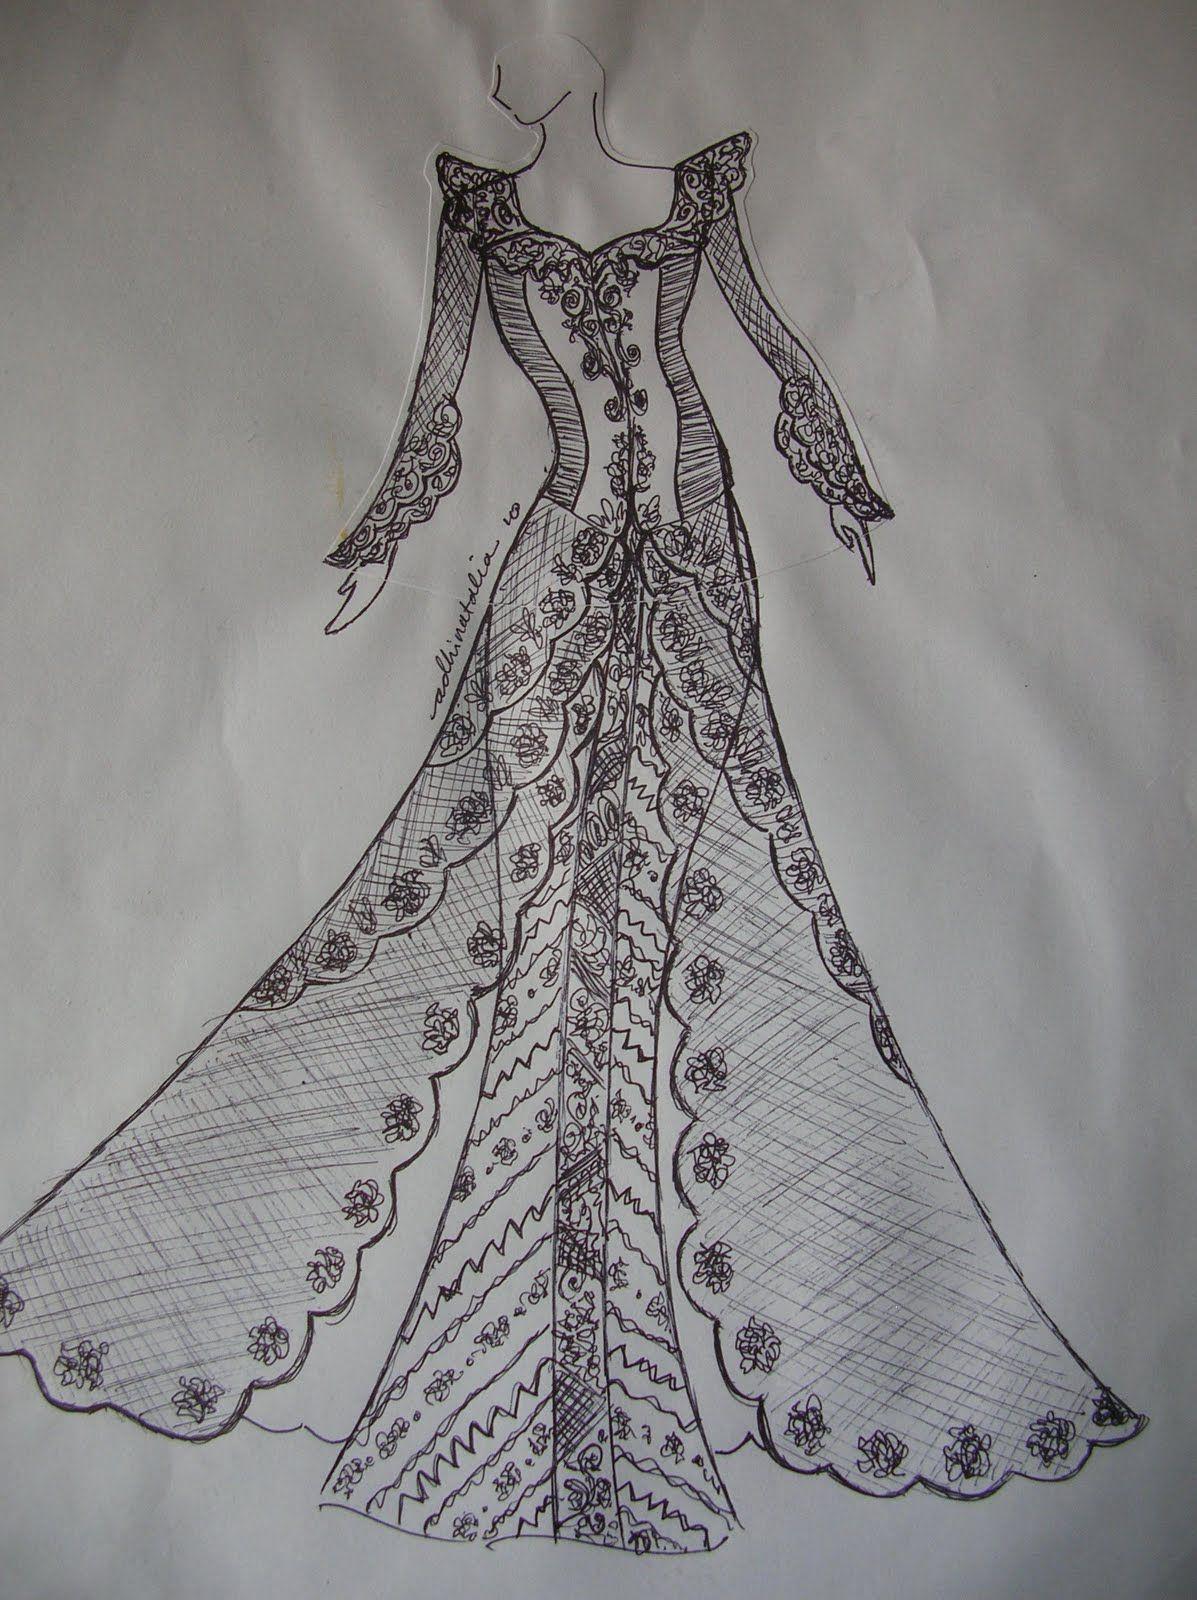 70 Sketsa Desain Baju Batik Batik Gaun Victoria Desain